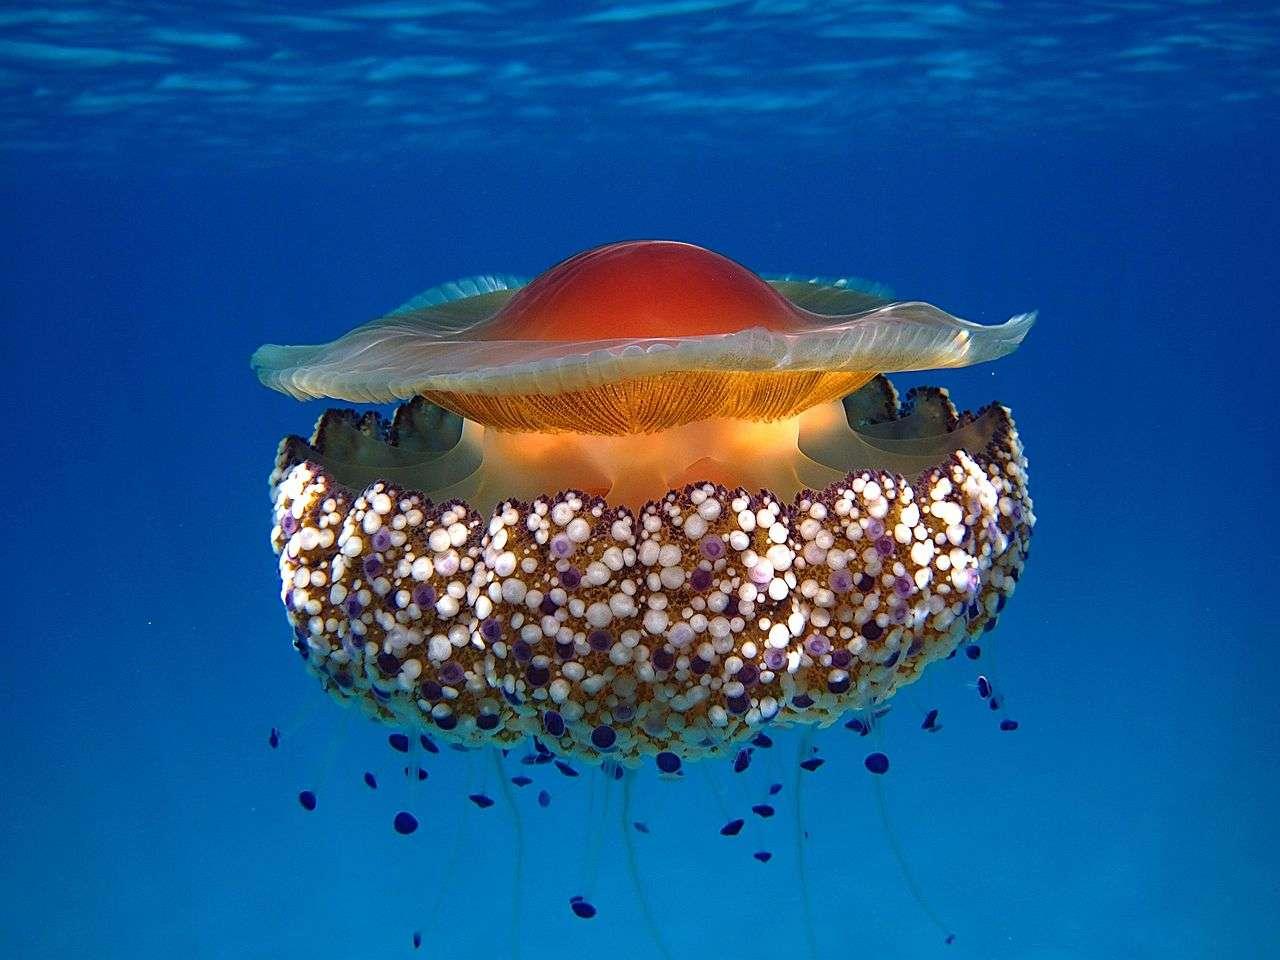 Une méduse œuf au plat photographiée en Sardaigne. © Fredski2013, Wikimedia, CC by-sa 3.0